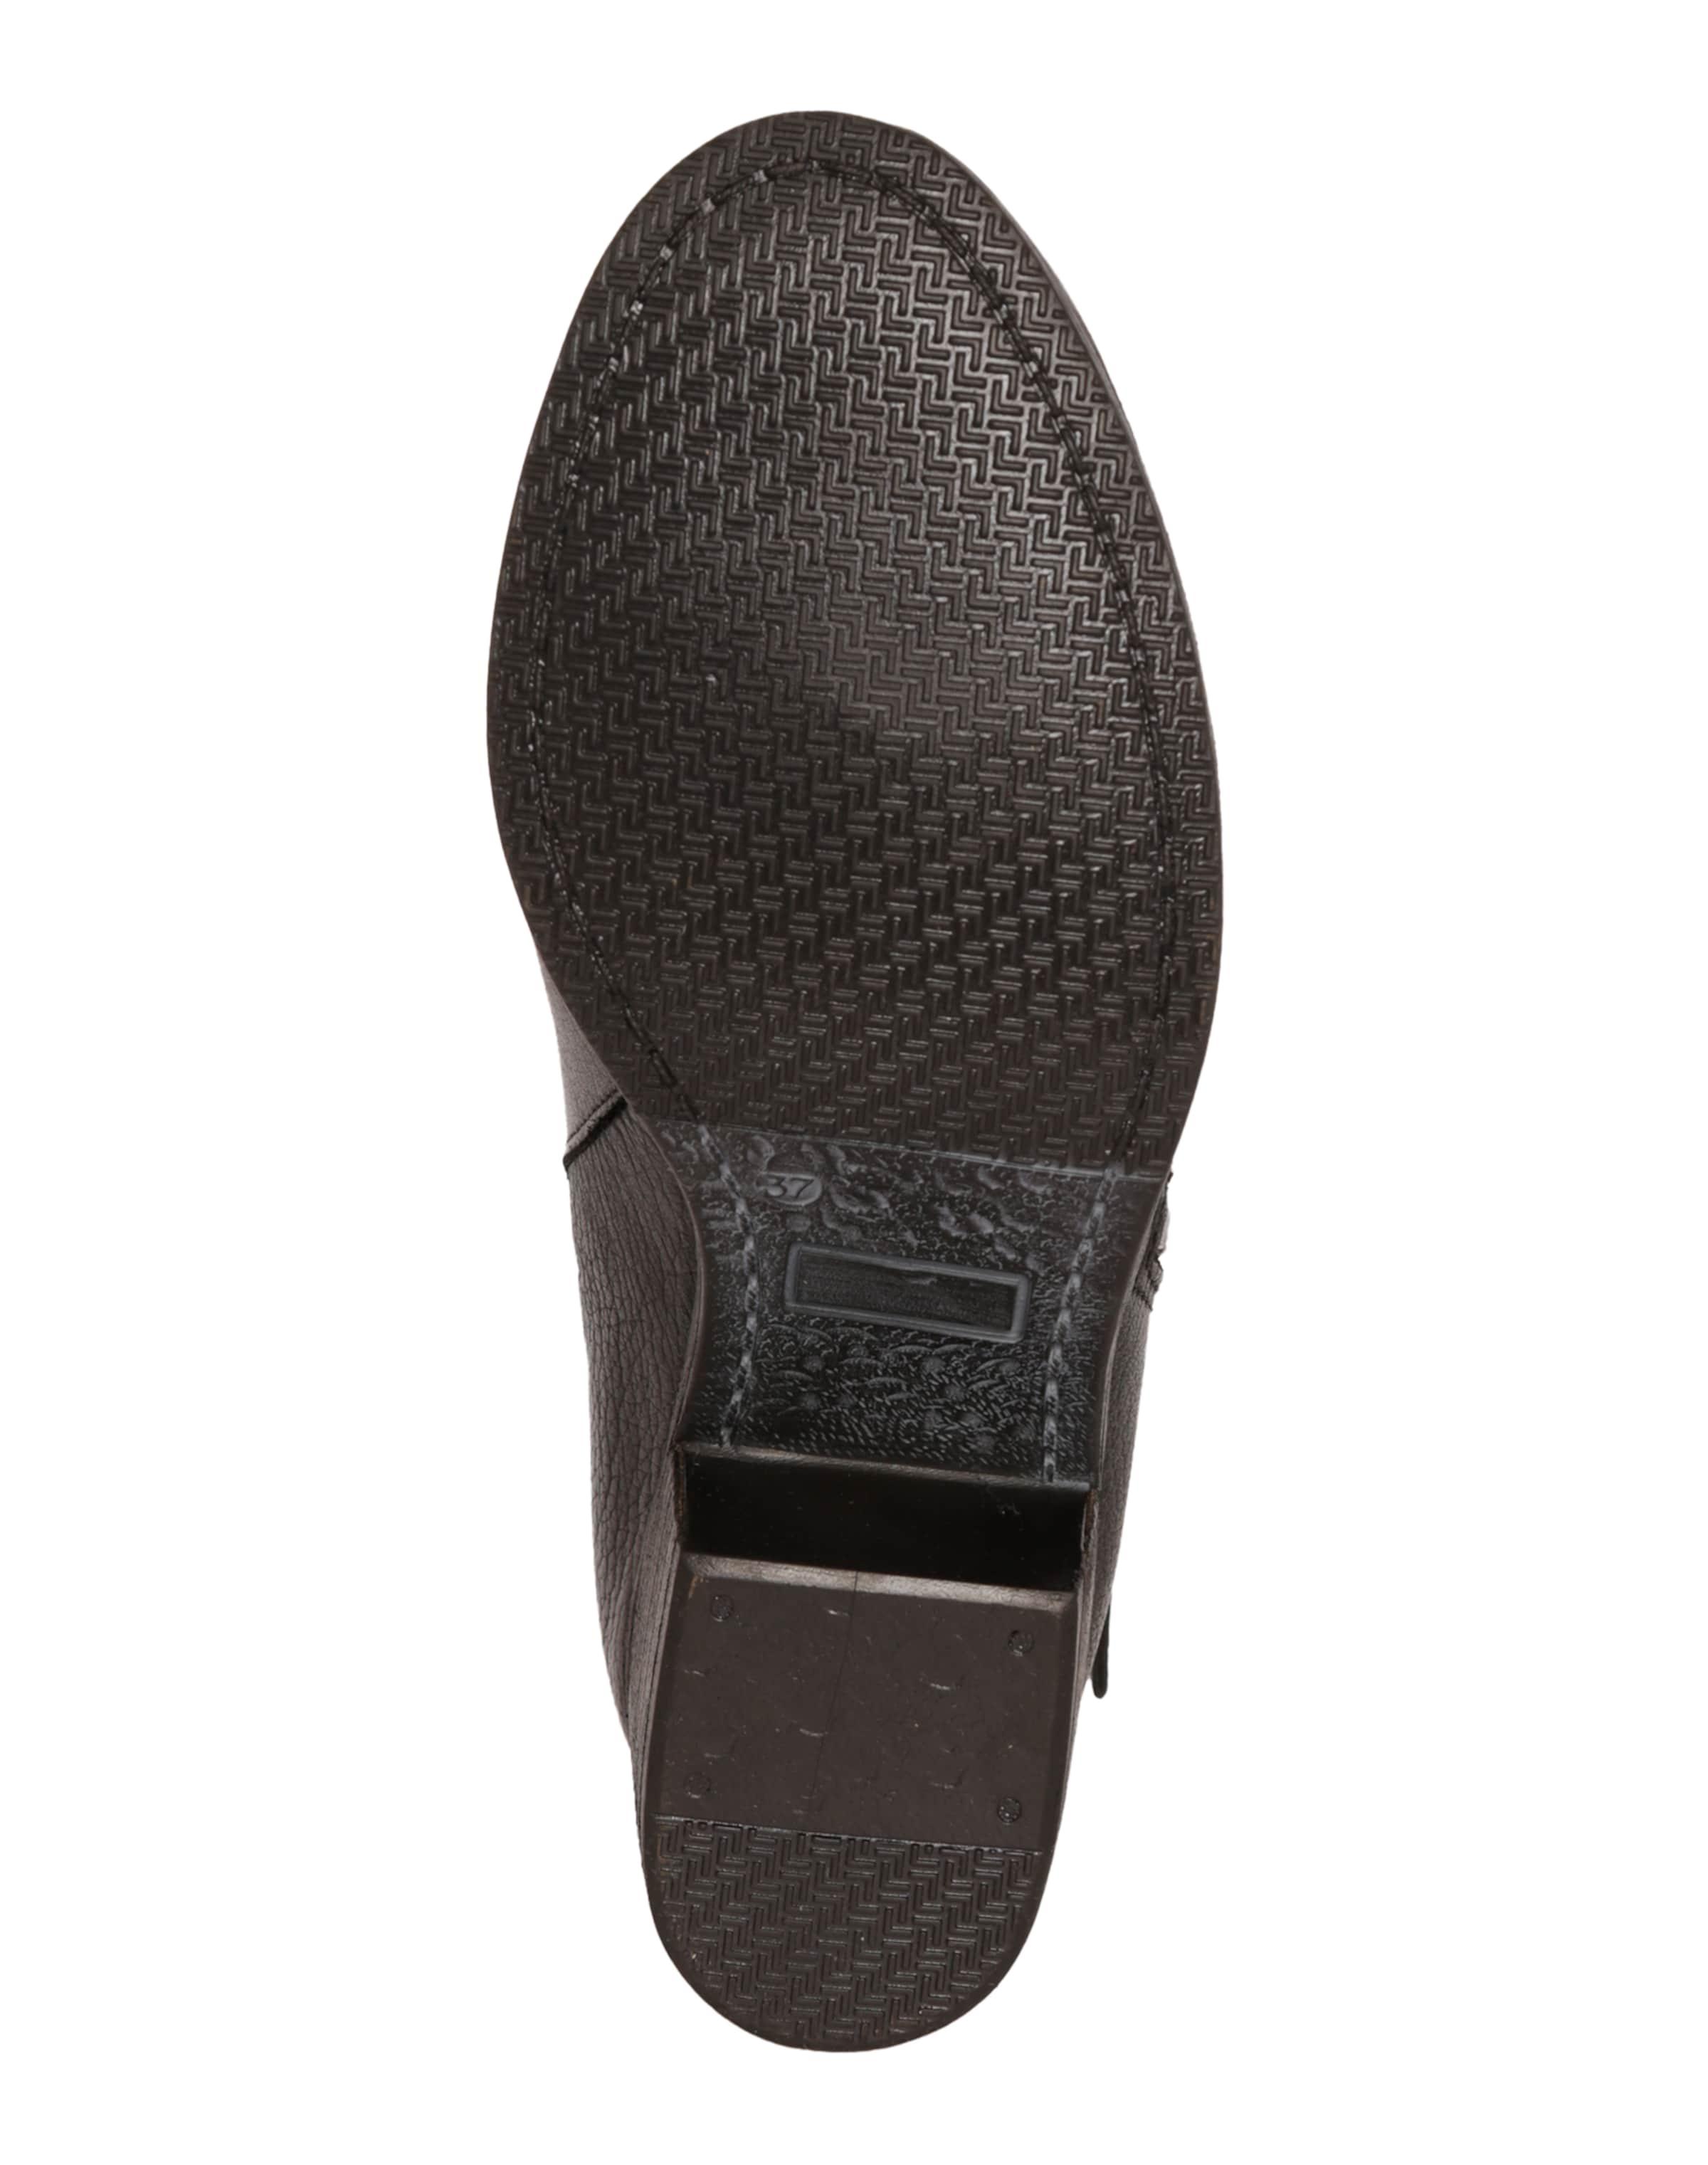 Ankle 'lotte' Of Schwarz Eden In Boots Apple bgymf7IYv6